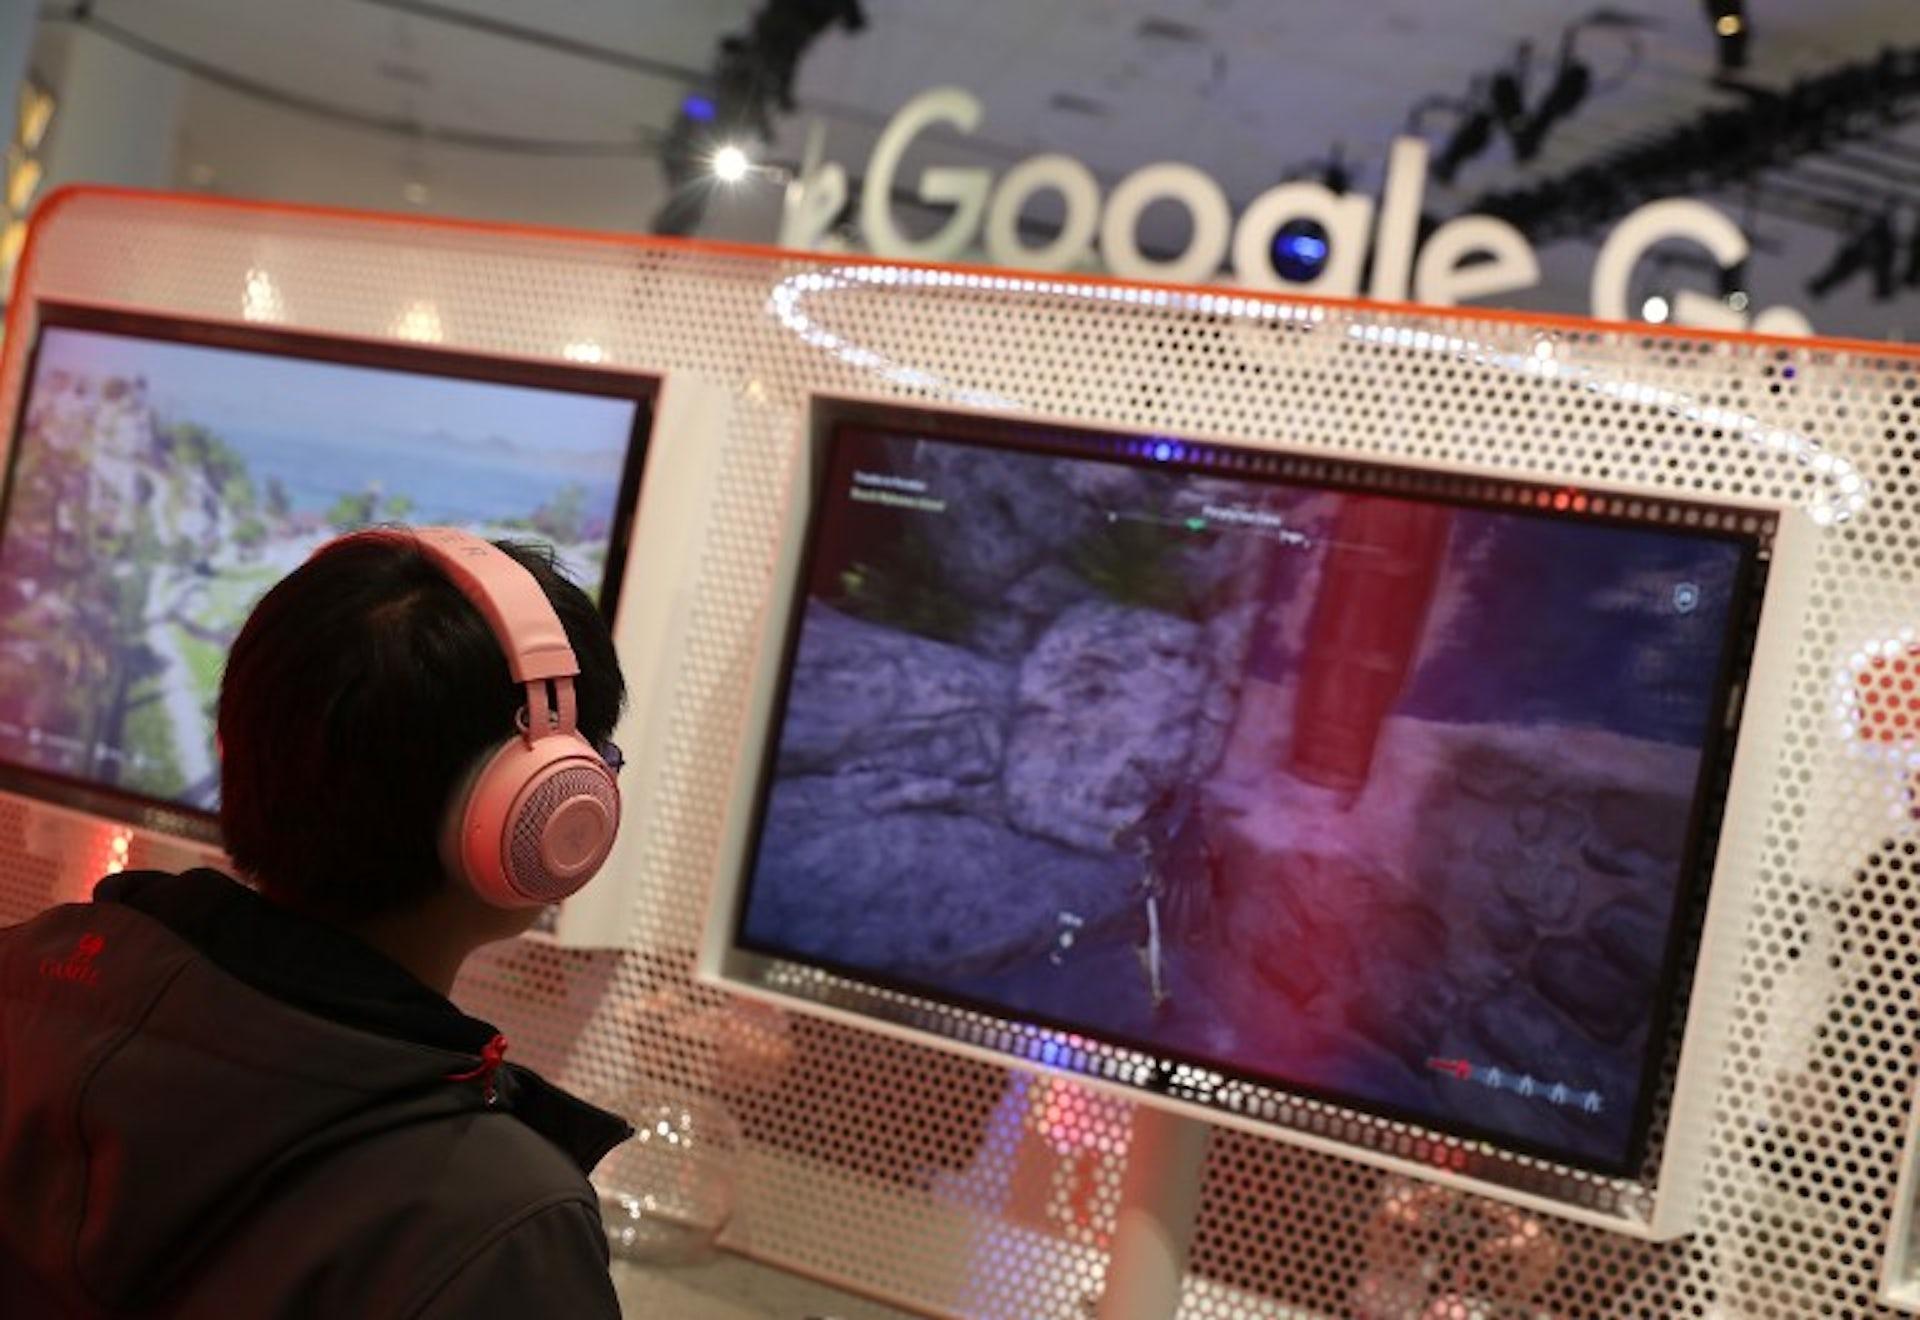 Podcast : Avec Stadia, Google va-t-il révolutionner le jeu vidéo ?